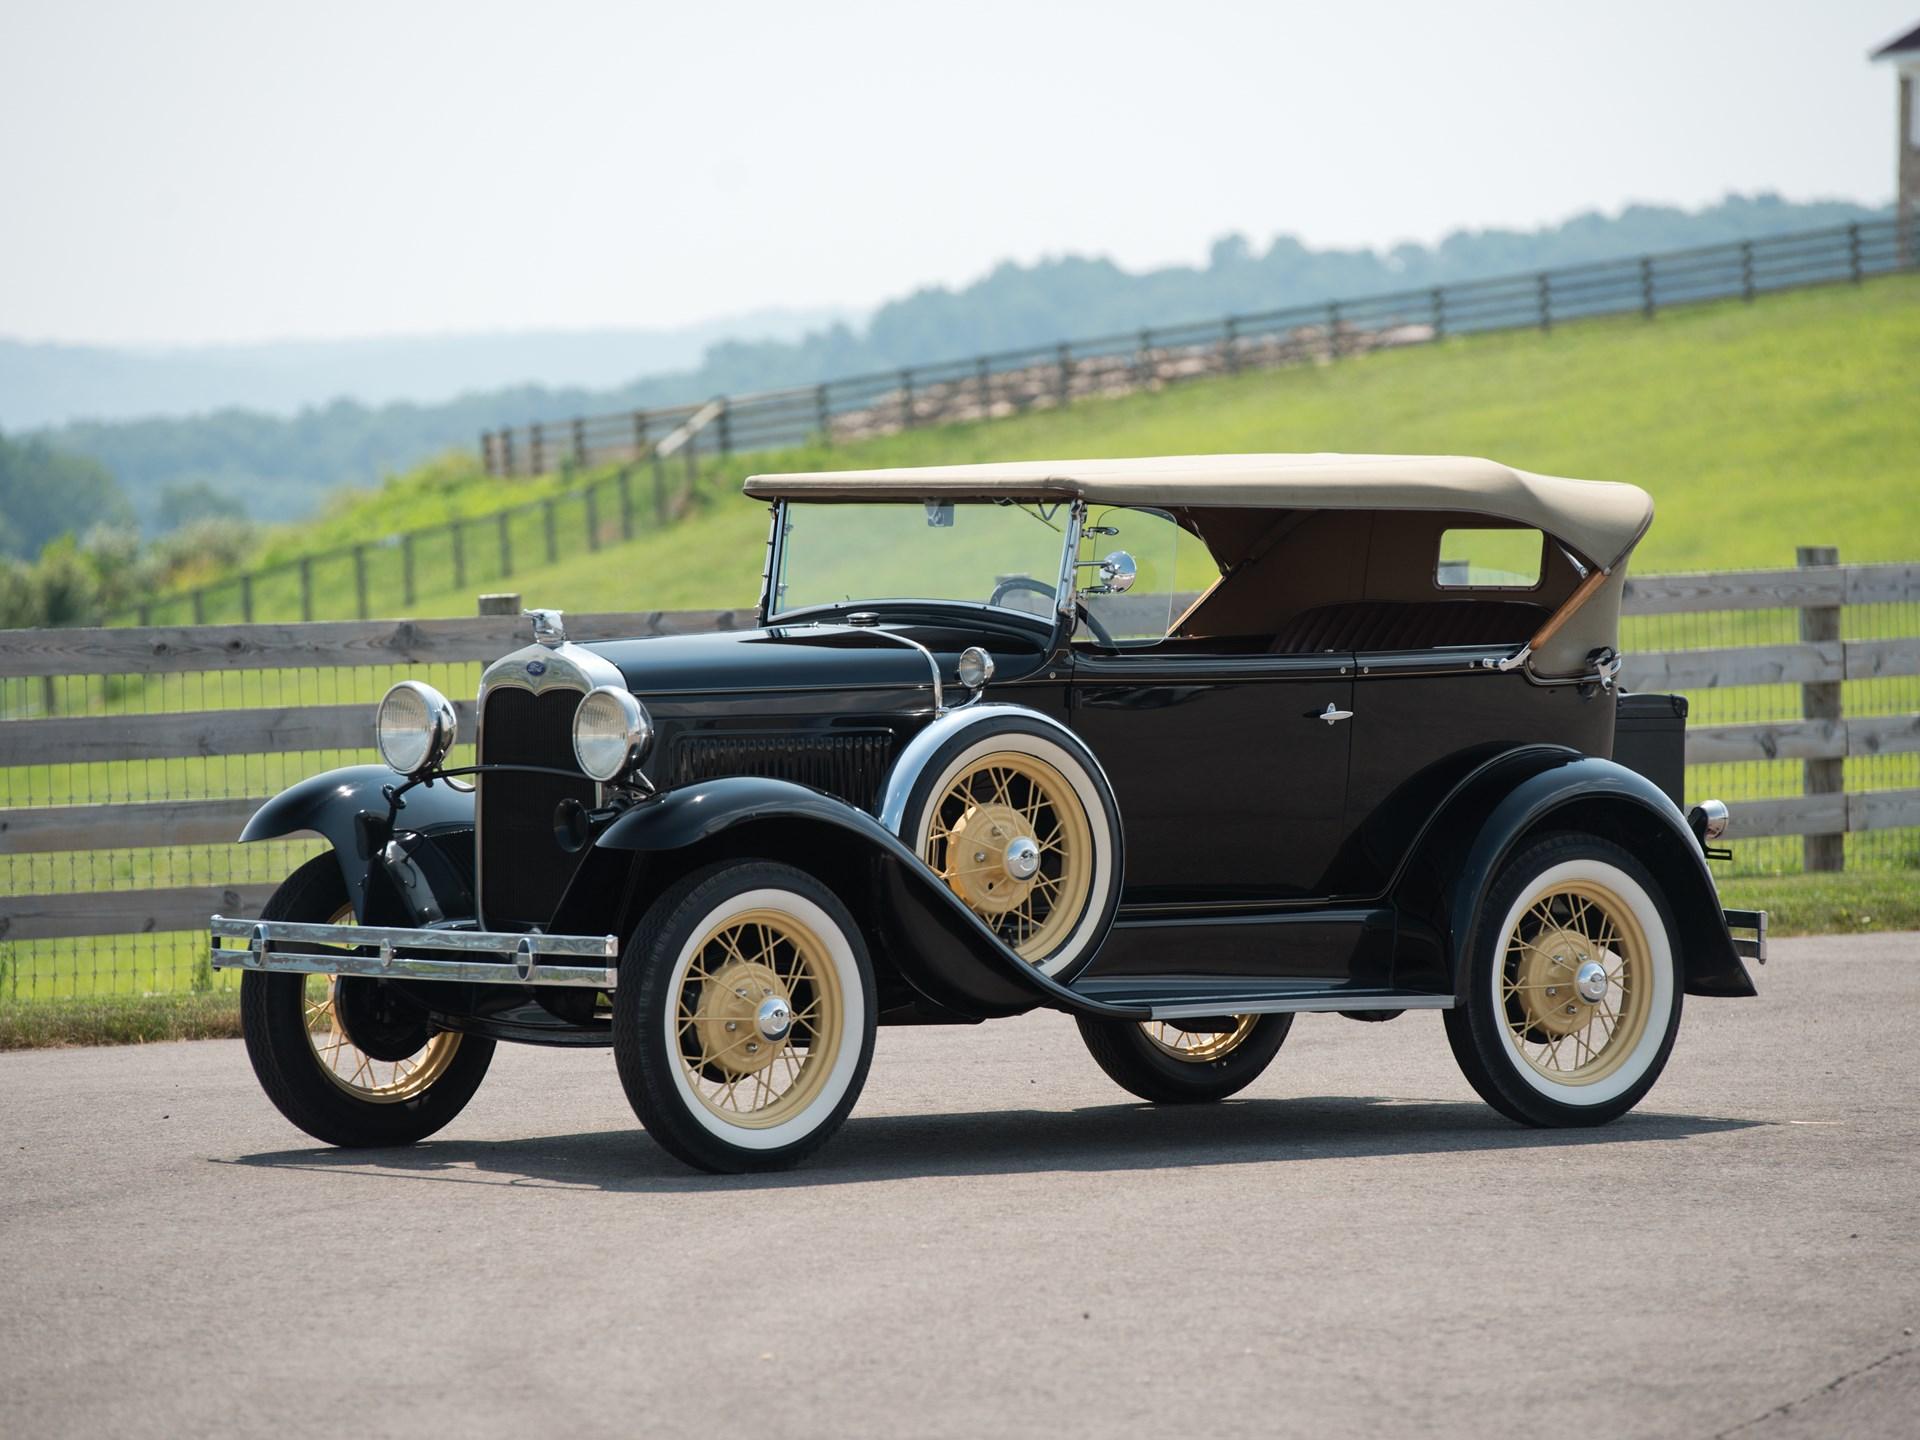 1930 ford model a deluxe phaeton